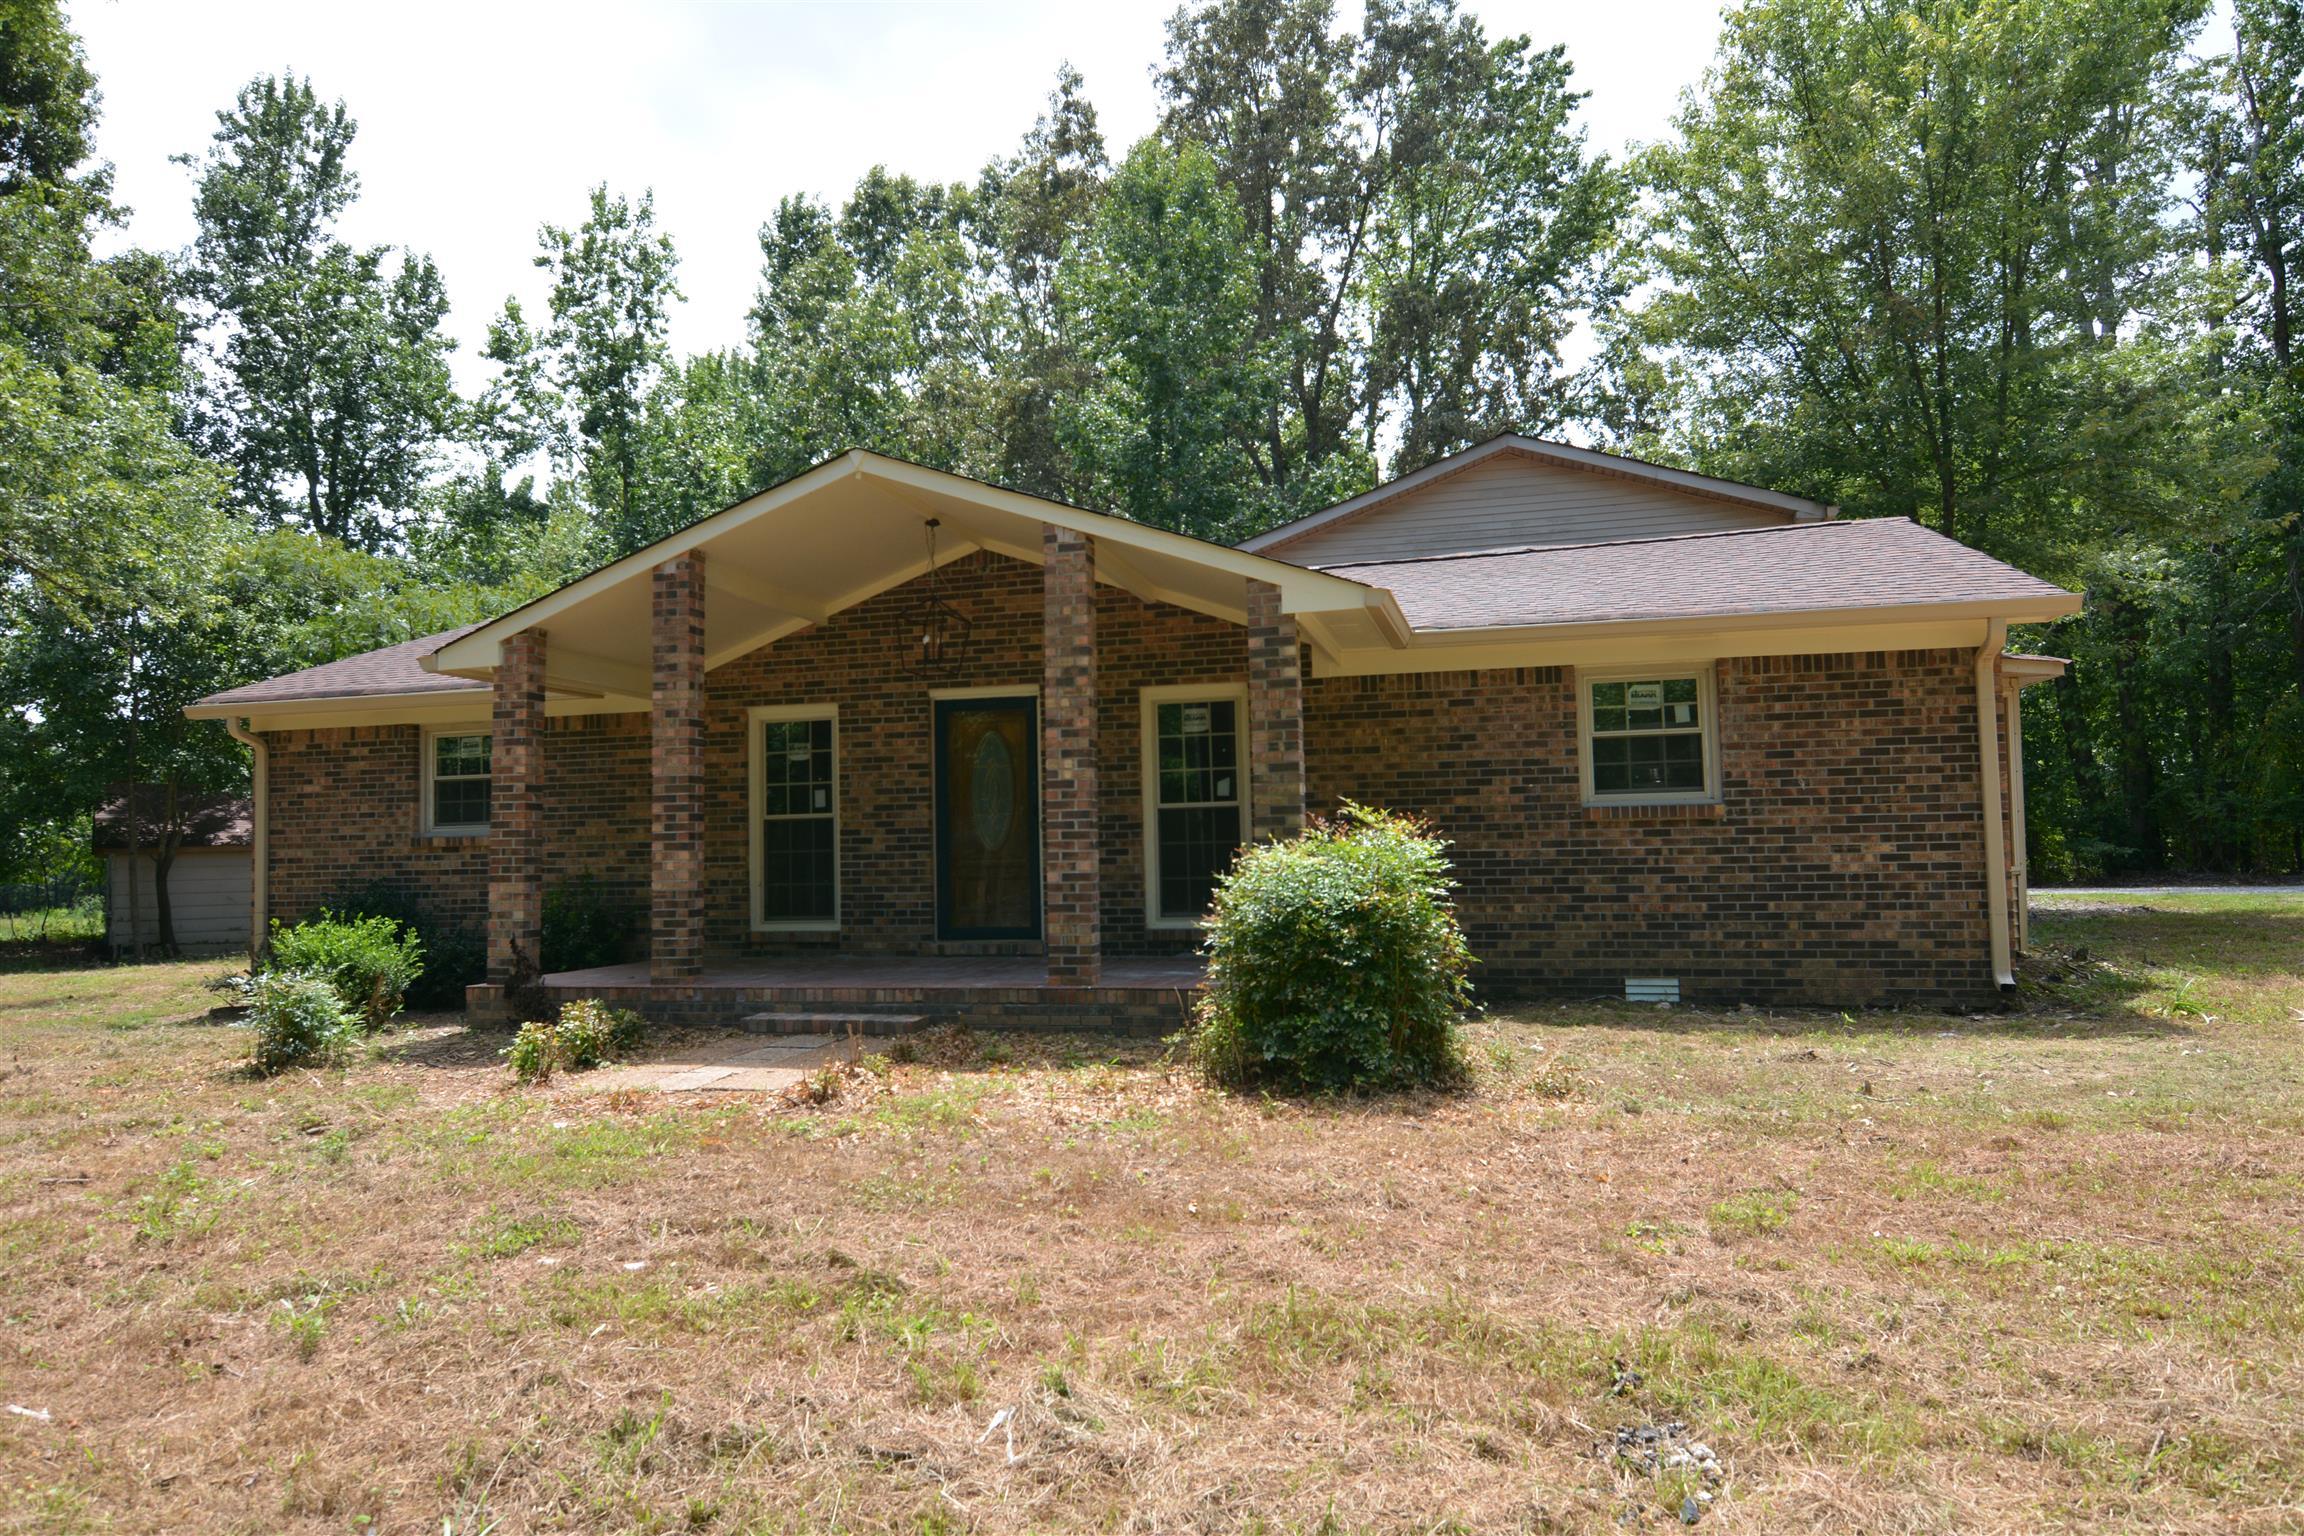 25 Pioneer Dr, Fayetteville, TN 37334 - Fayetteville, TN real estate listing